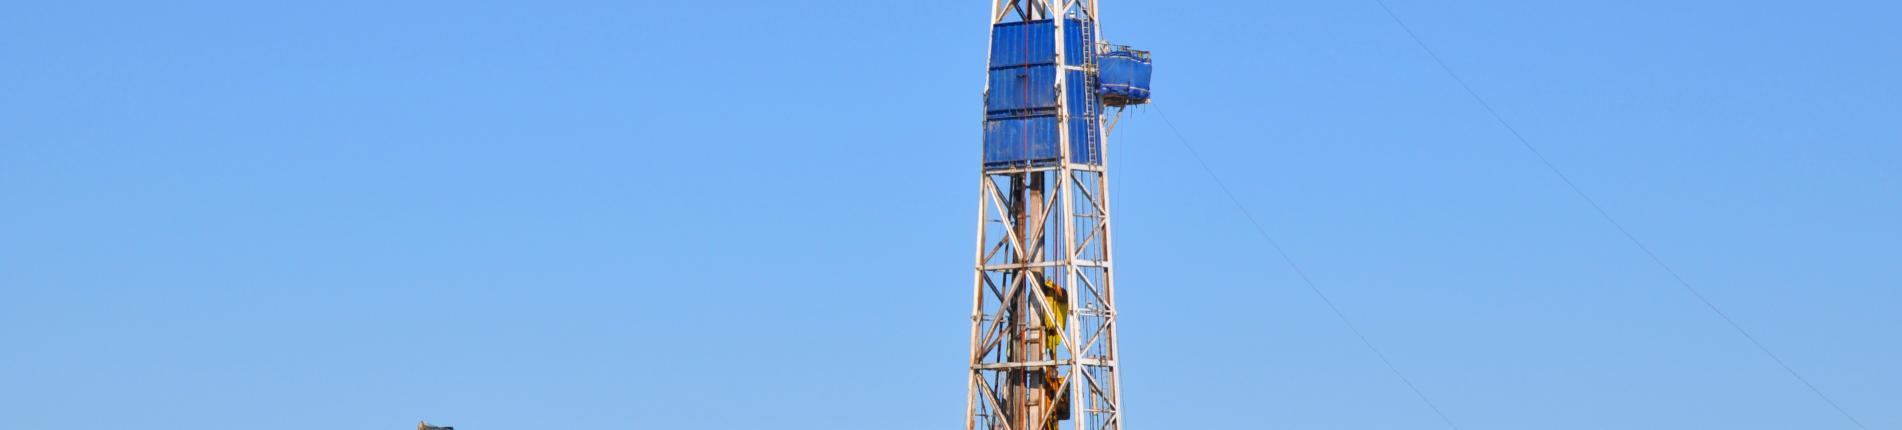 Fraking en texas